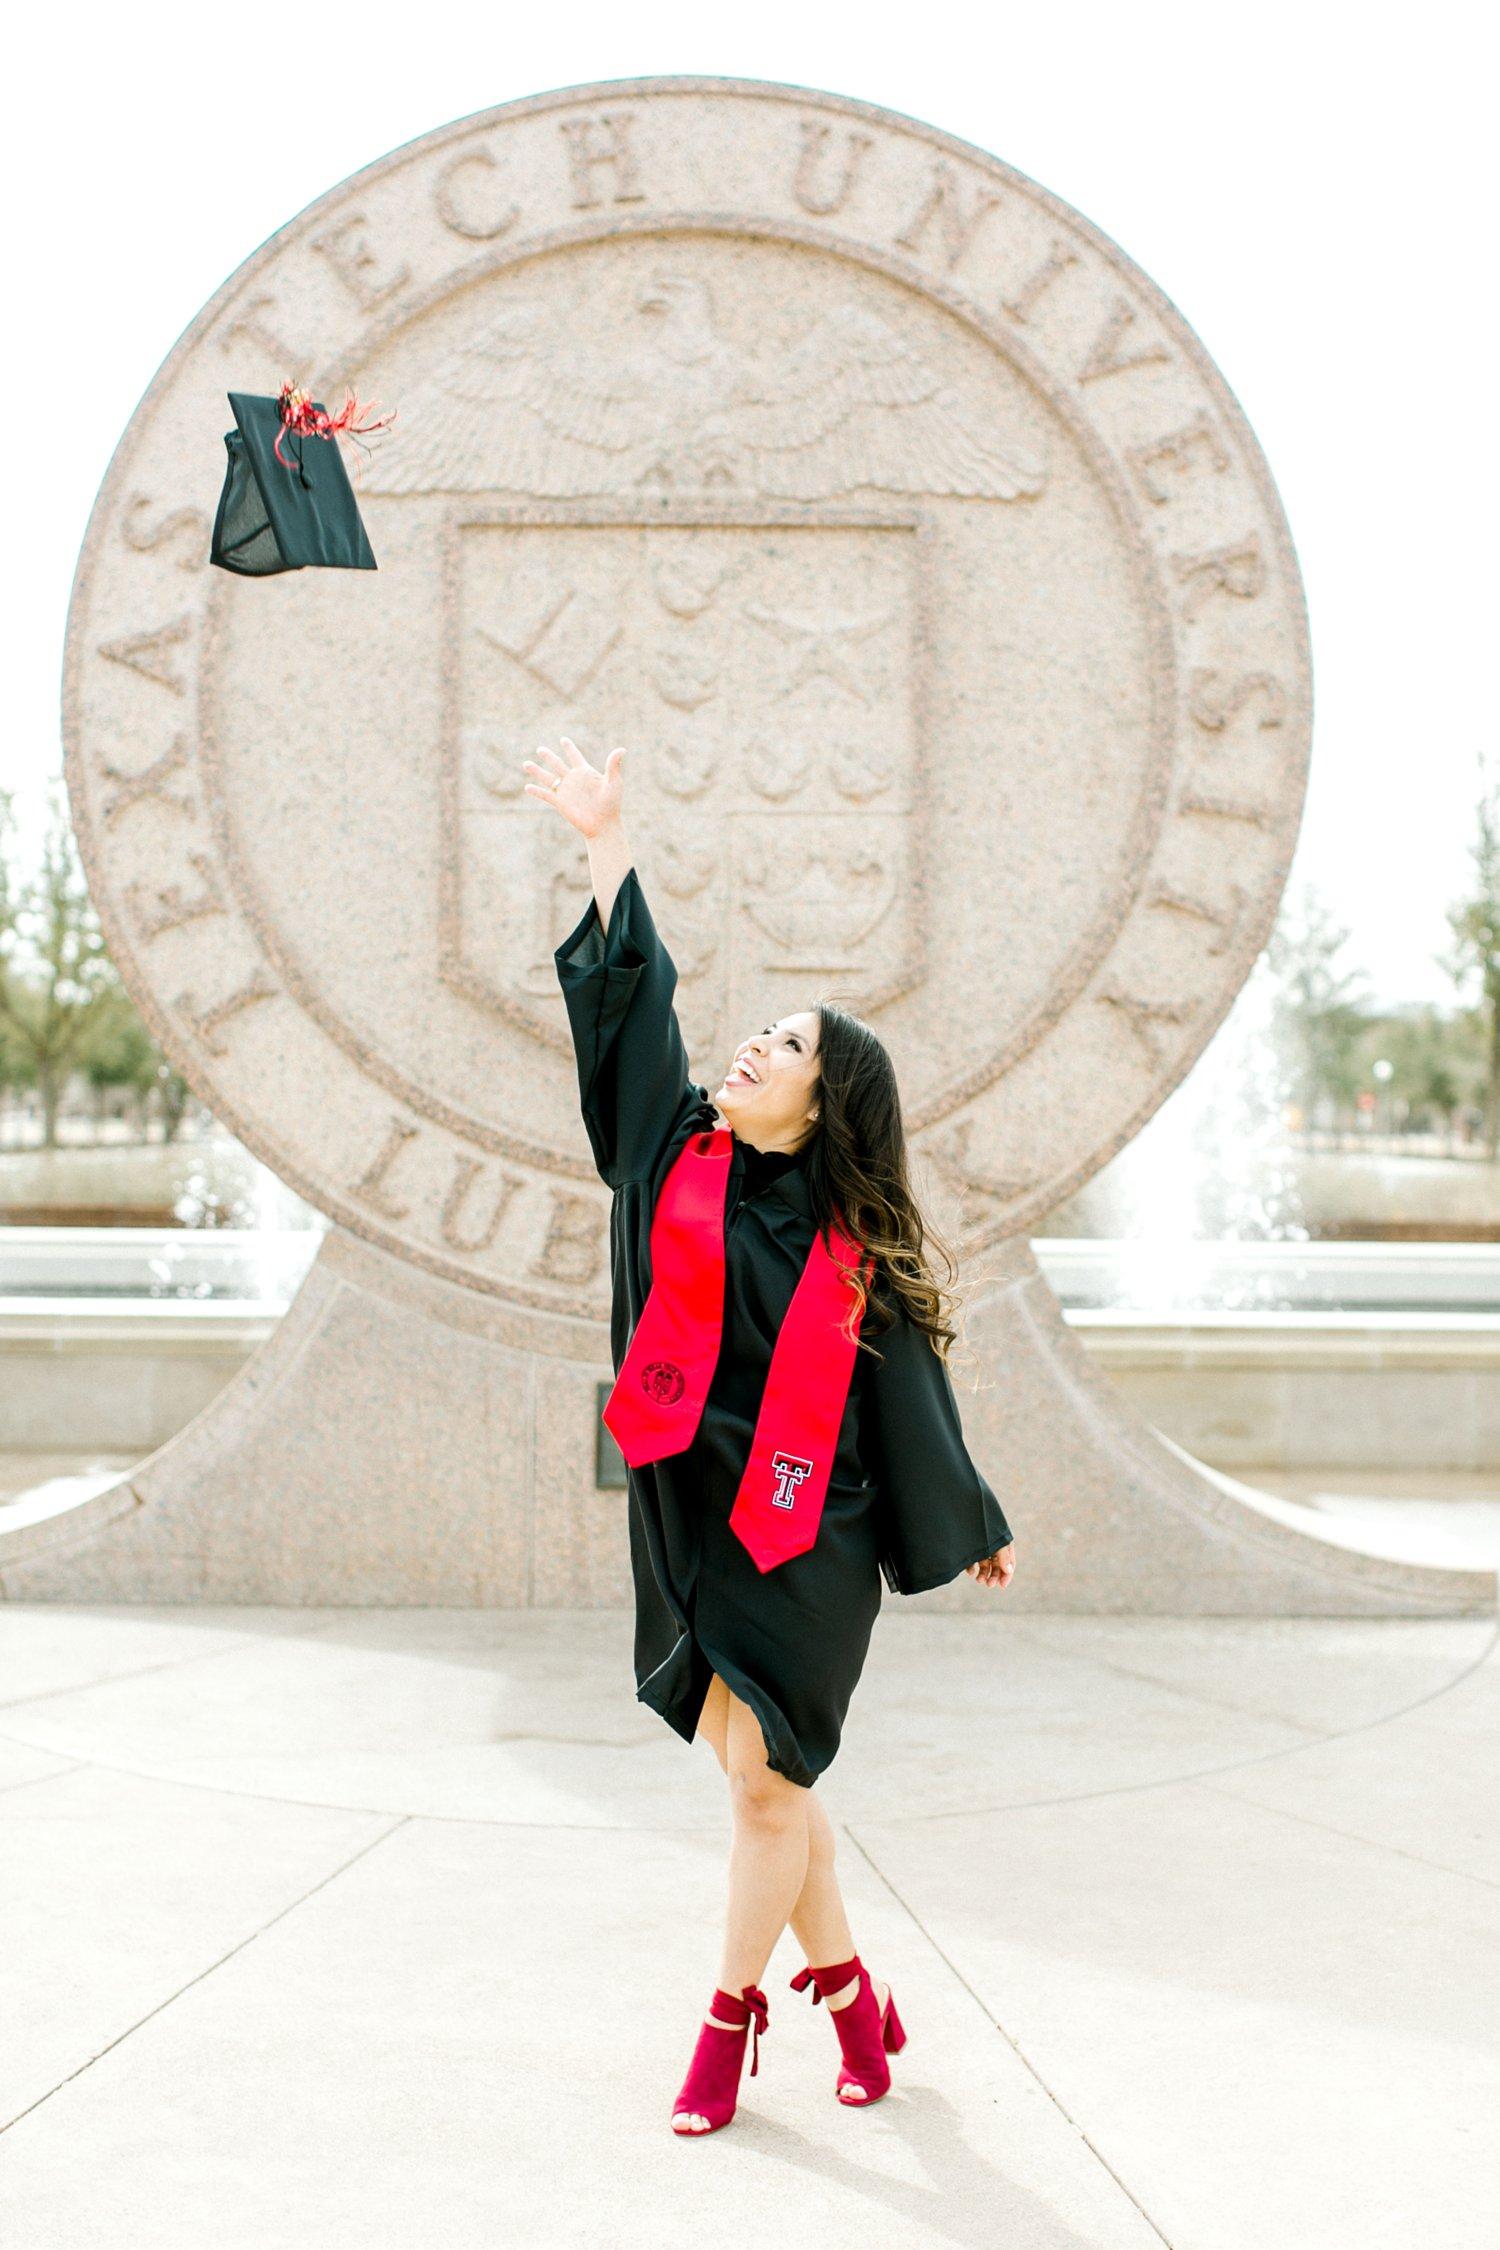 Desirae-morales-texas-tech-university-senior-photography_0023.jpg